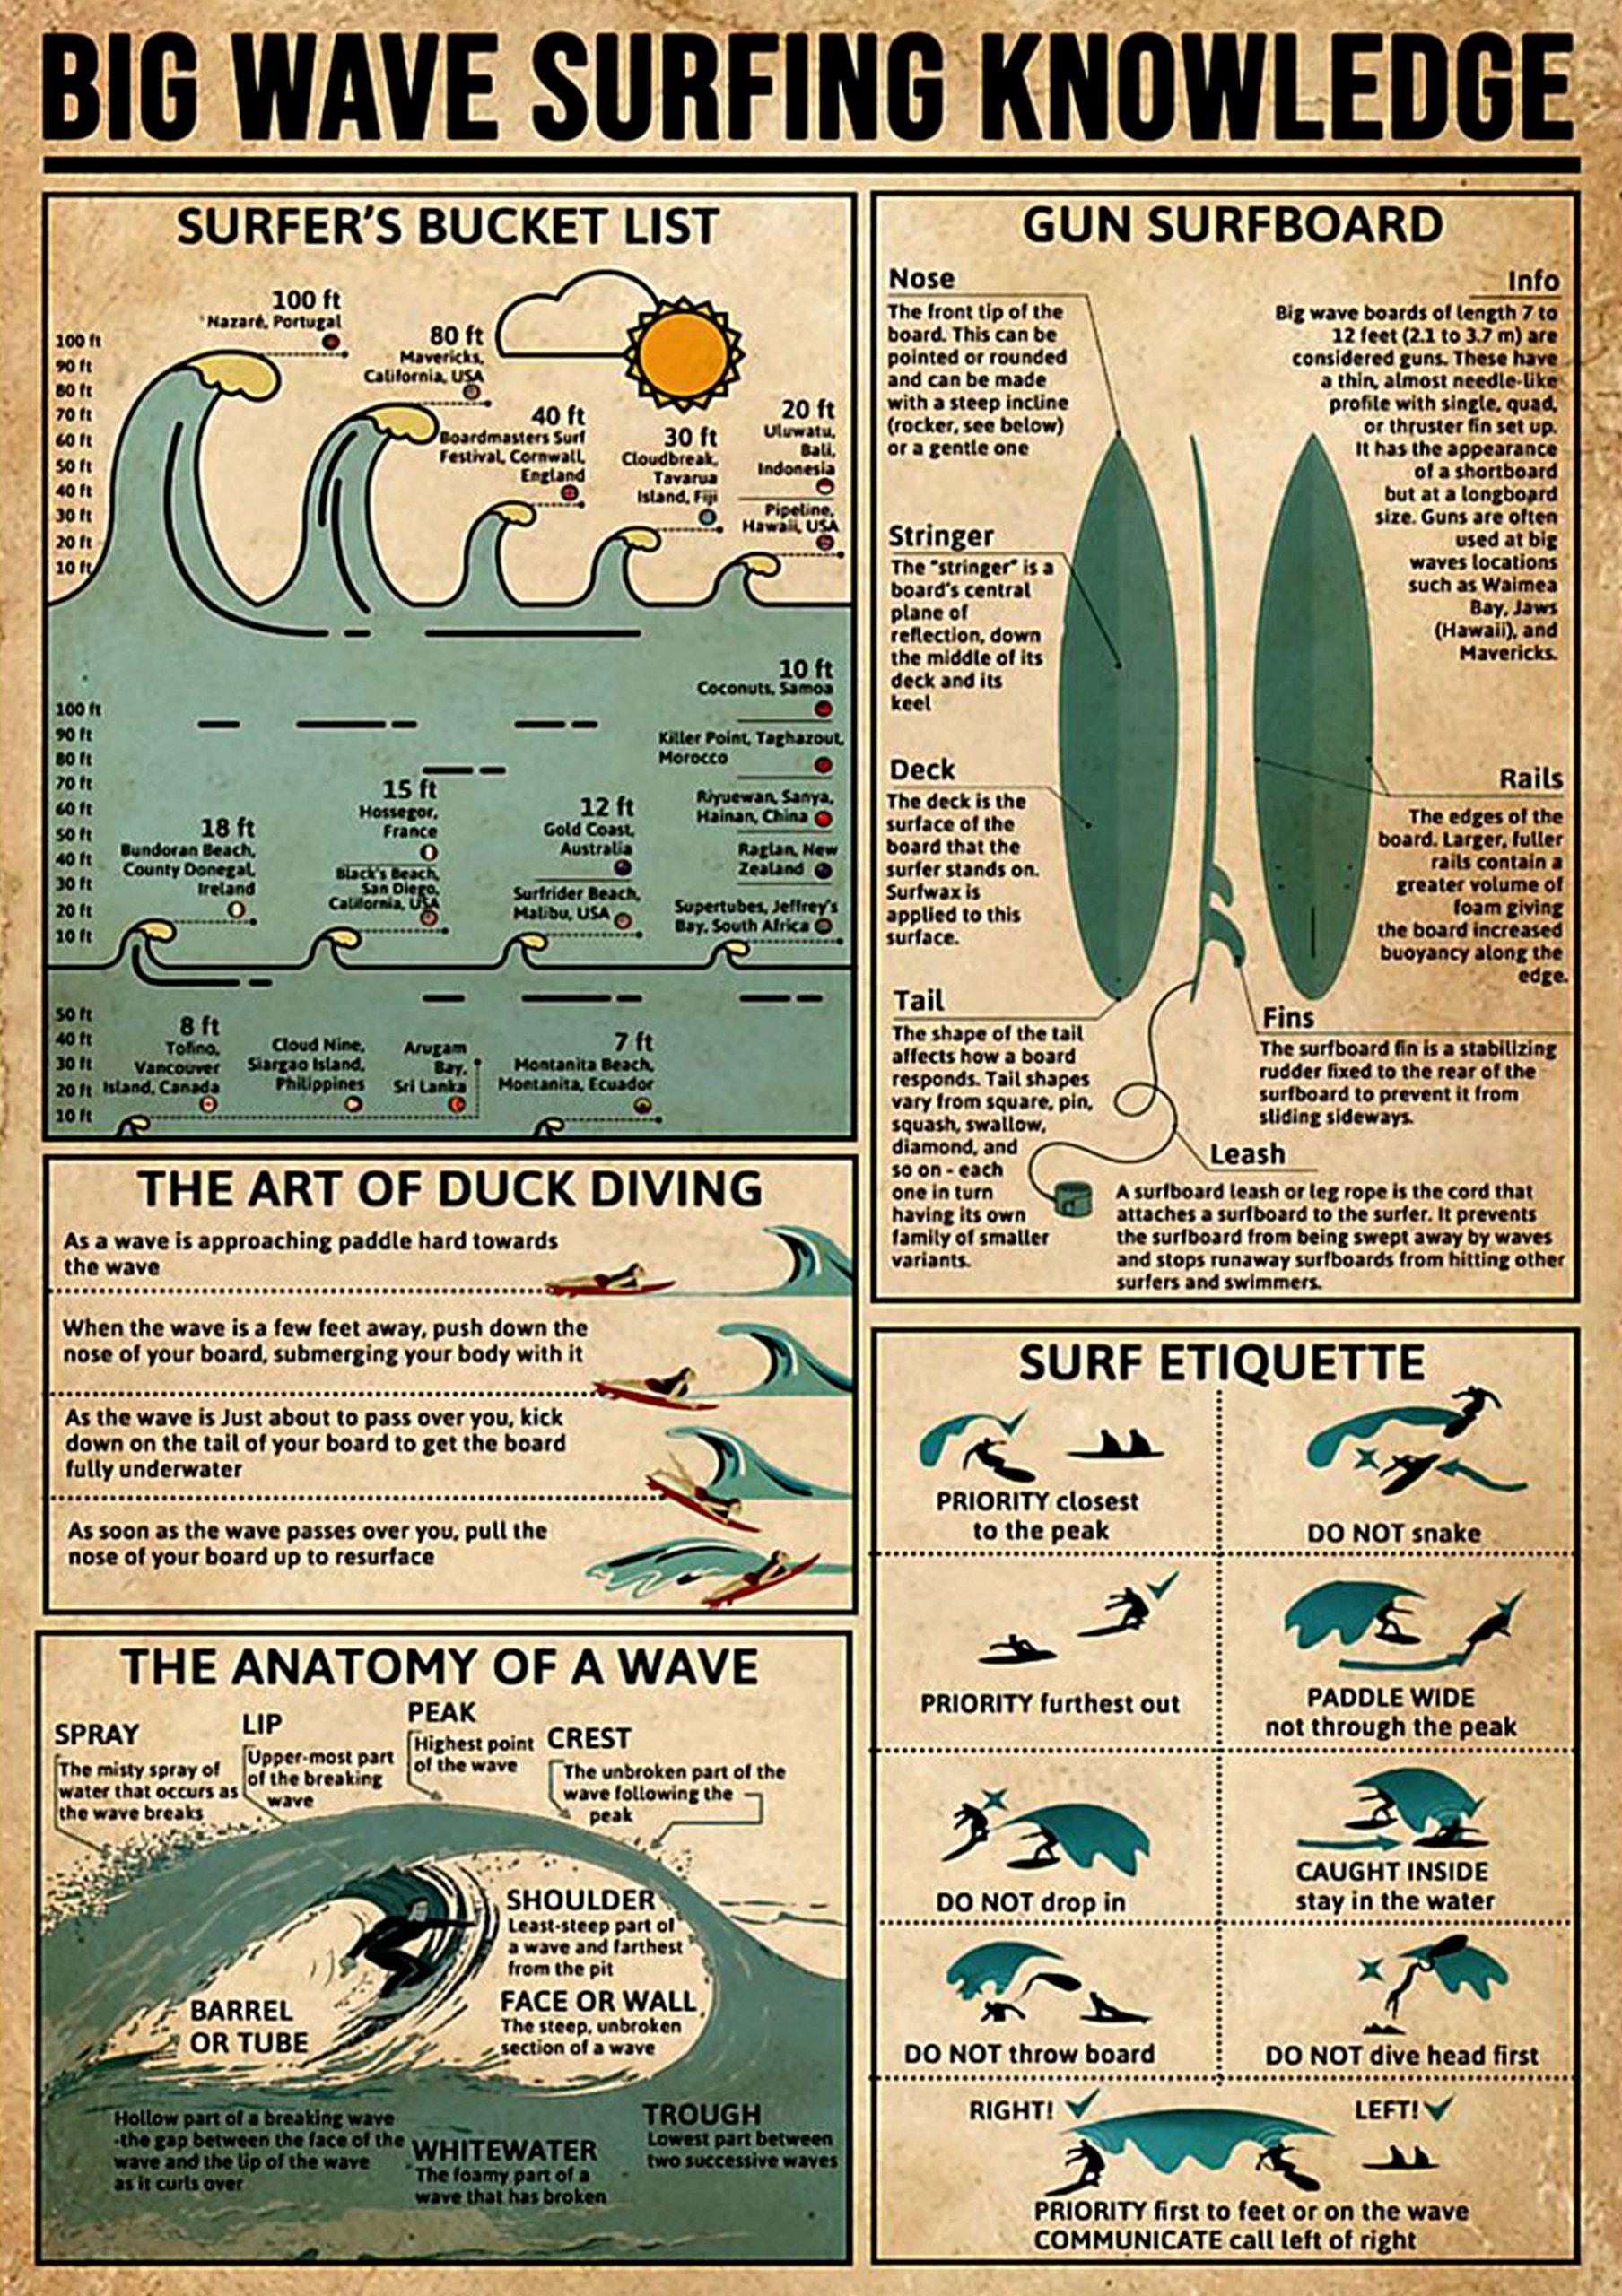 vintage big wave surfing knowledge poster 1 - Copy (3)